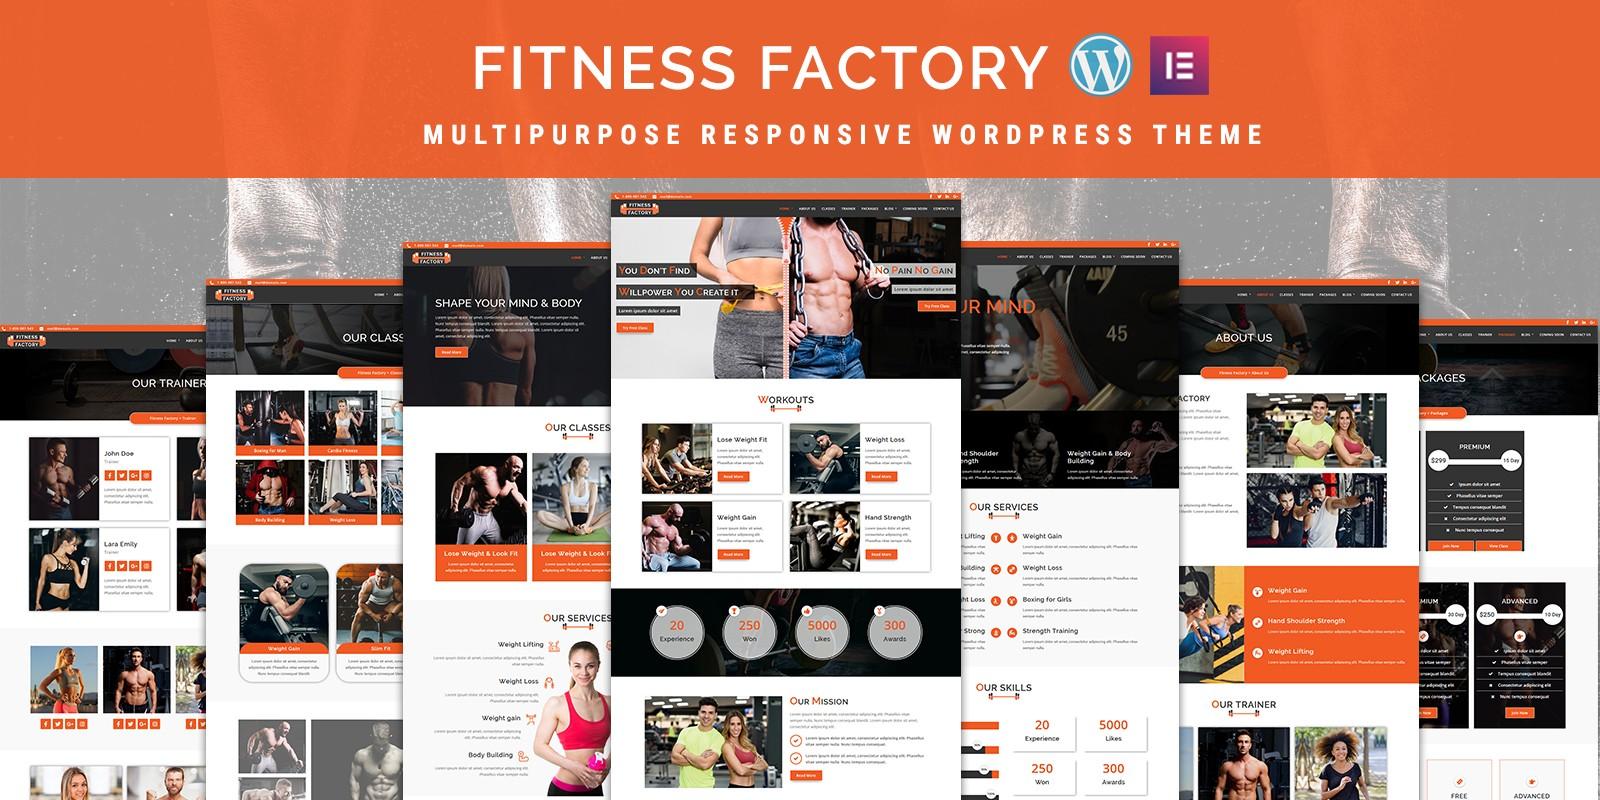 FitnessFactory - WordPress Theme